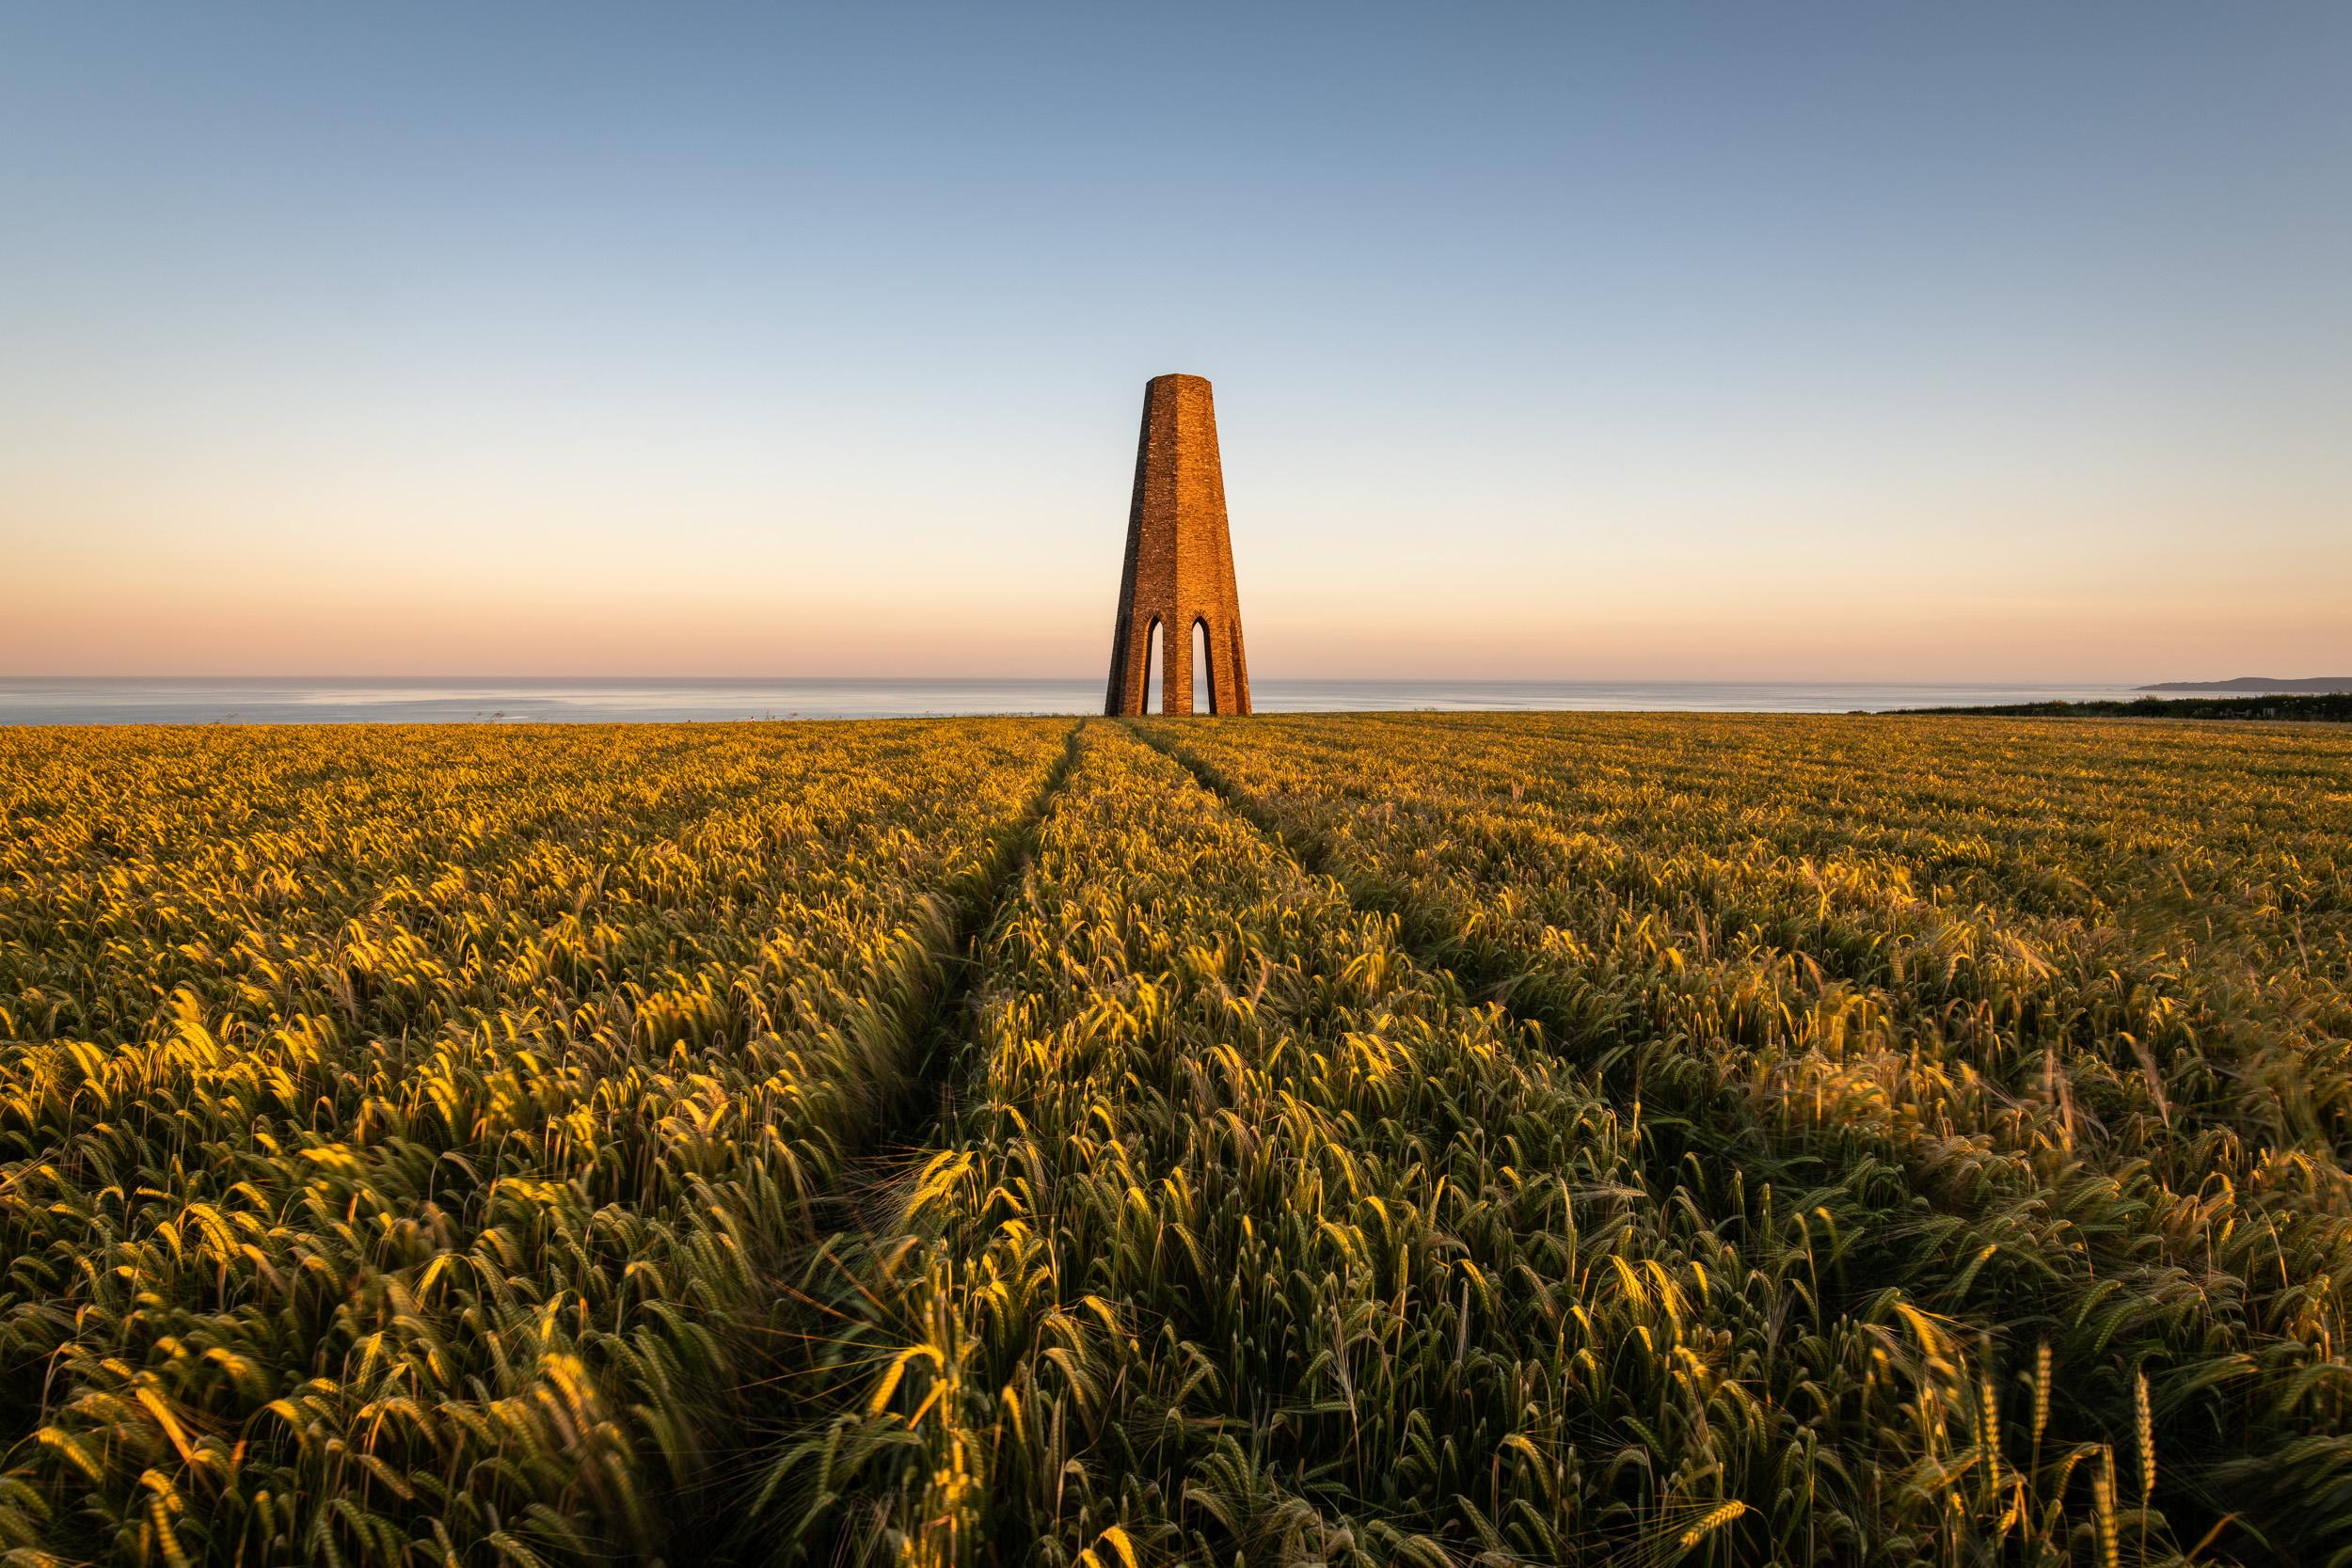 Sunset at The Daymark  - Devon: Nikon D850, Nikkor 16-35 mm f/4 @ 20mm, 1/5th sec @ ISO 64, f/13, Lee Filters Circular Polariser.